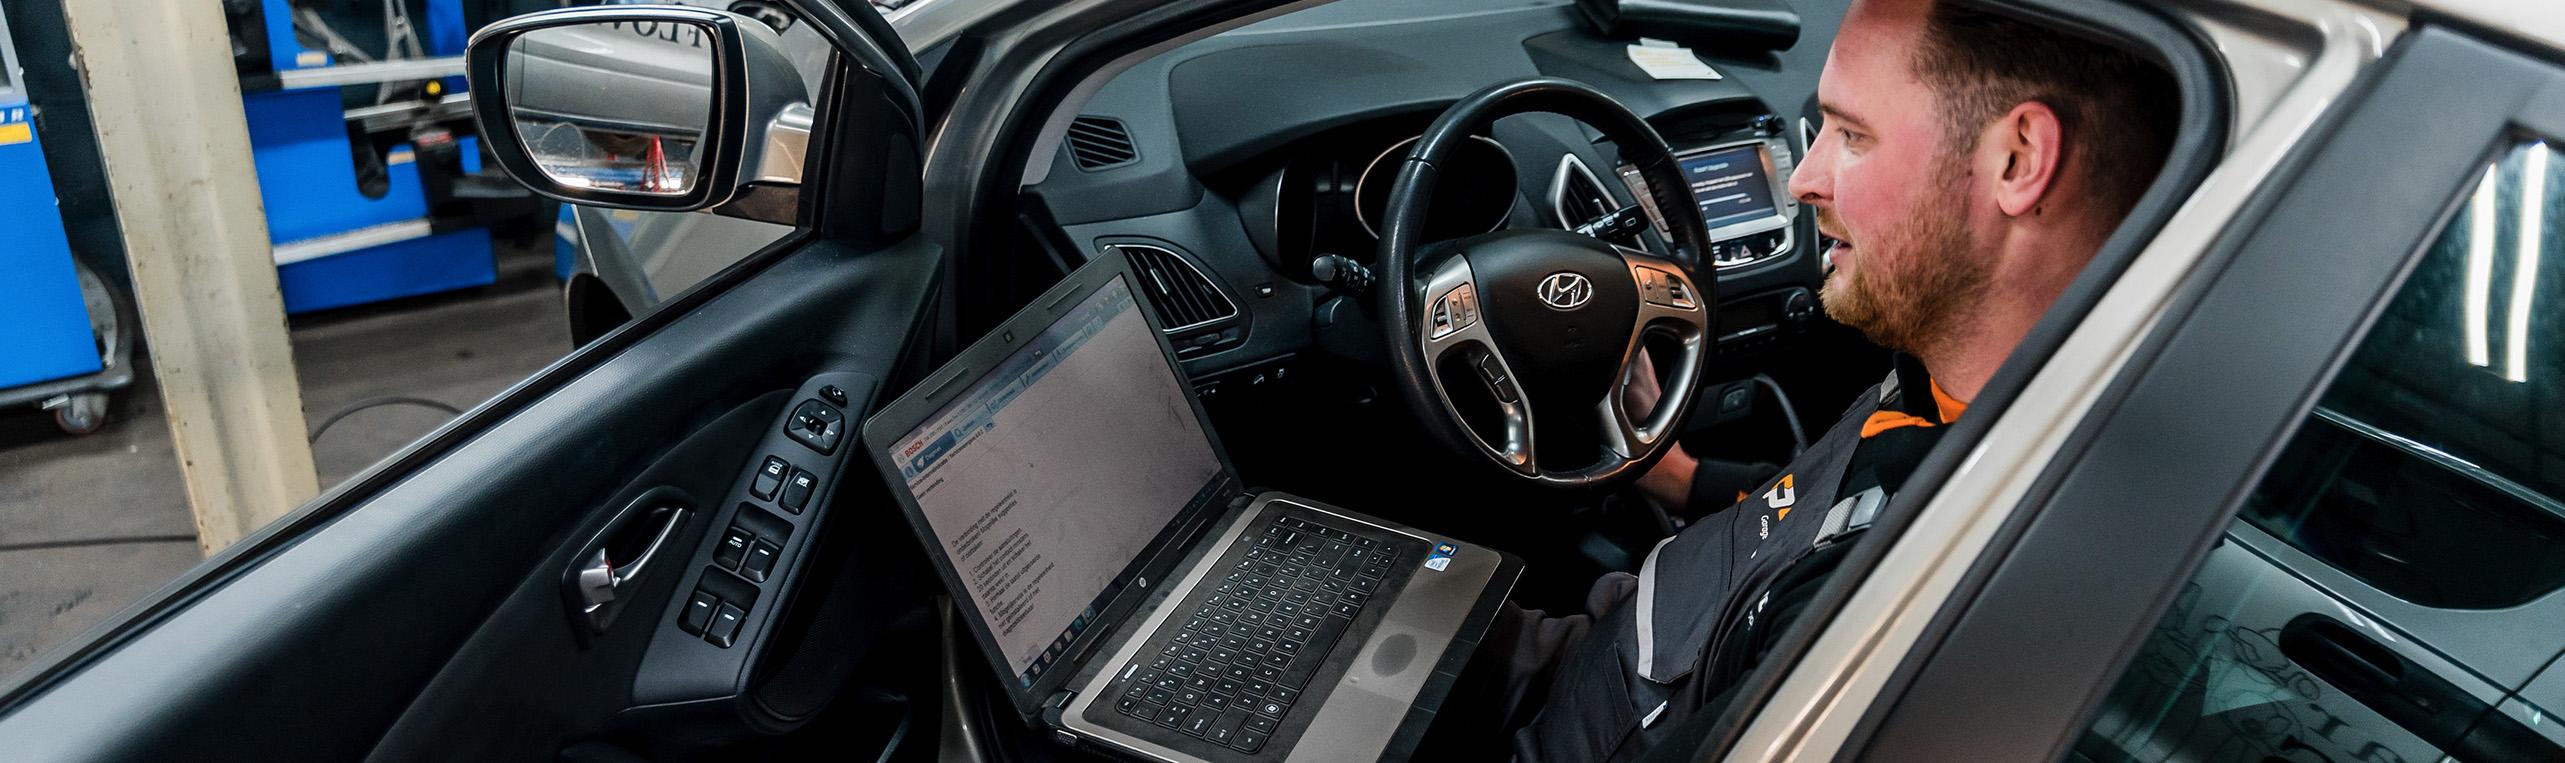 Diagnose en storing uitlezen auto Carprof Autobedrijf Schuurmans